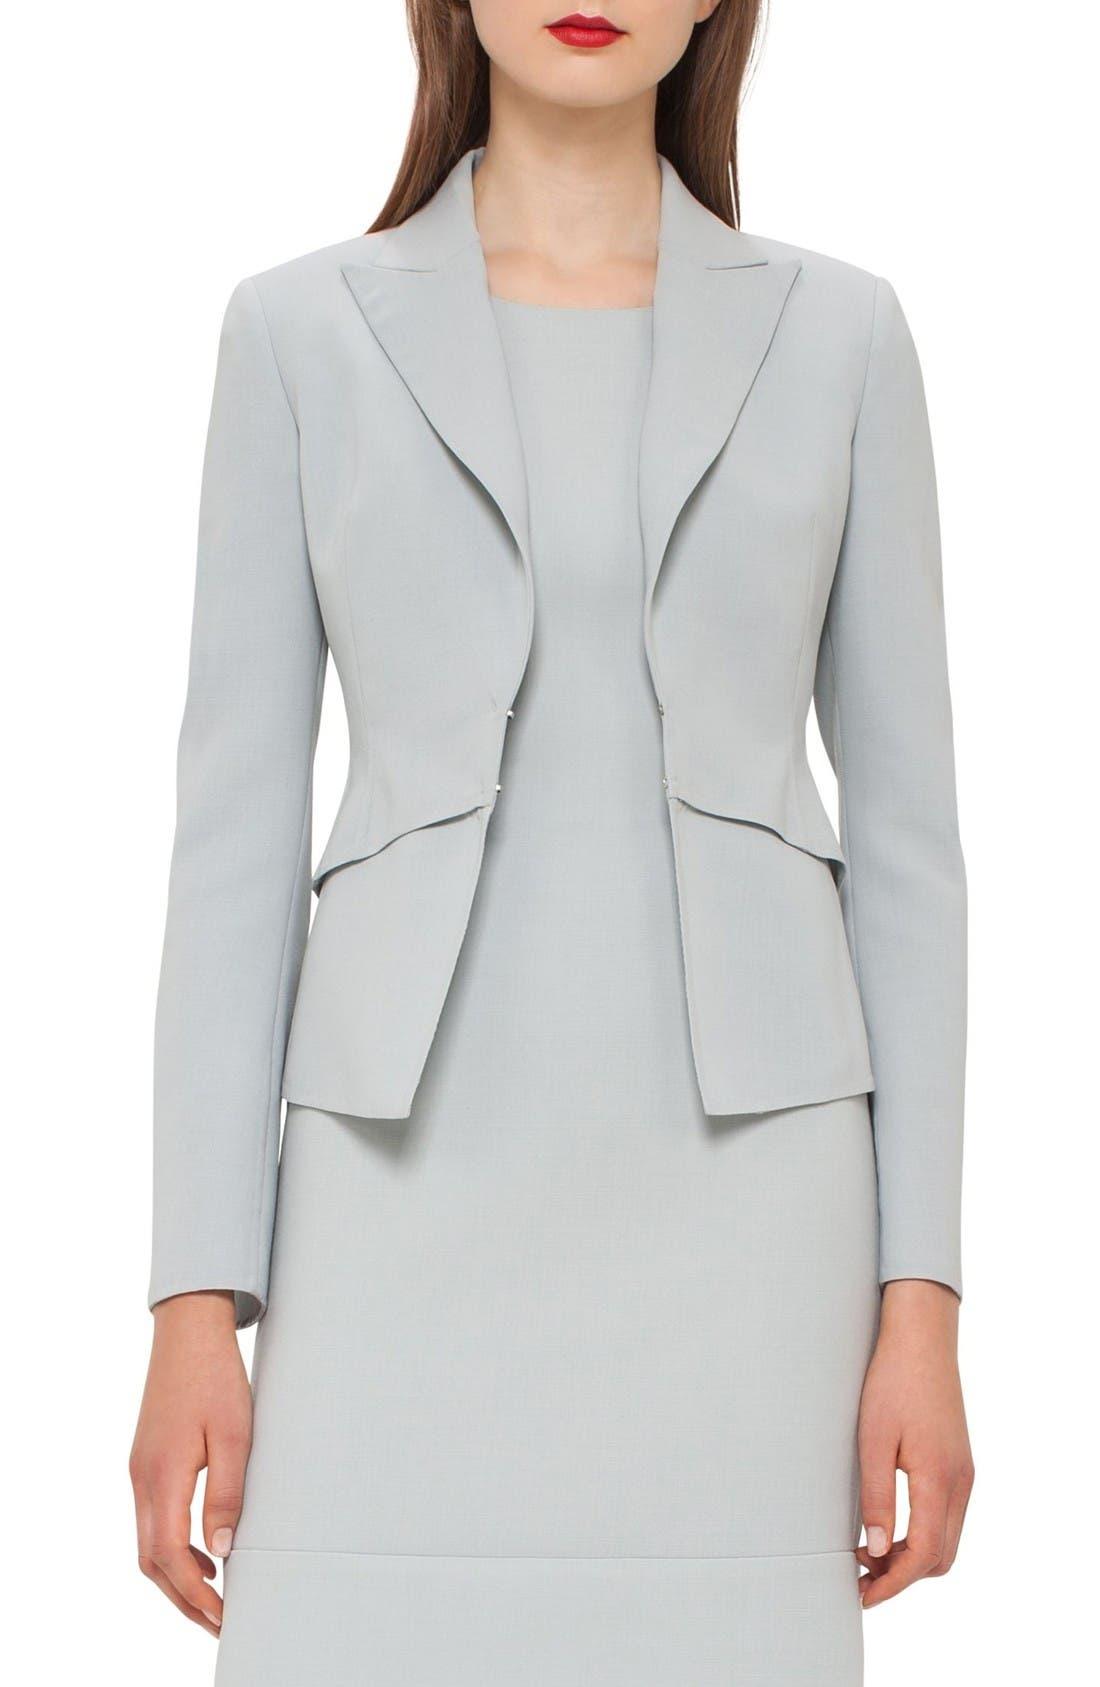 Alternate Image 1 Selected - Akris Double Face Wool Blend Jacket